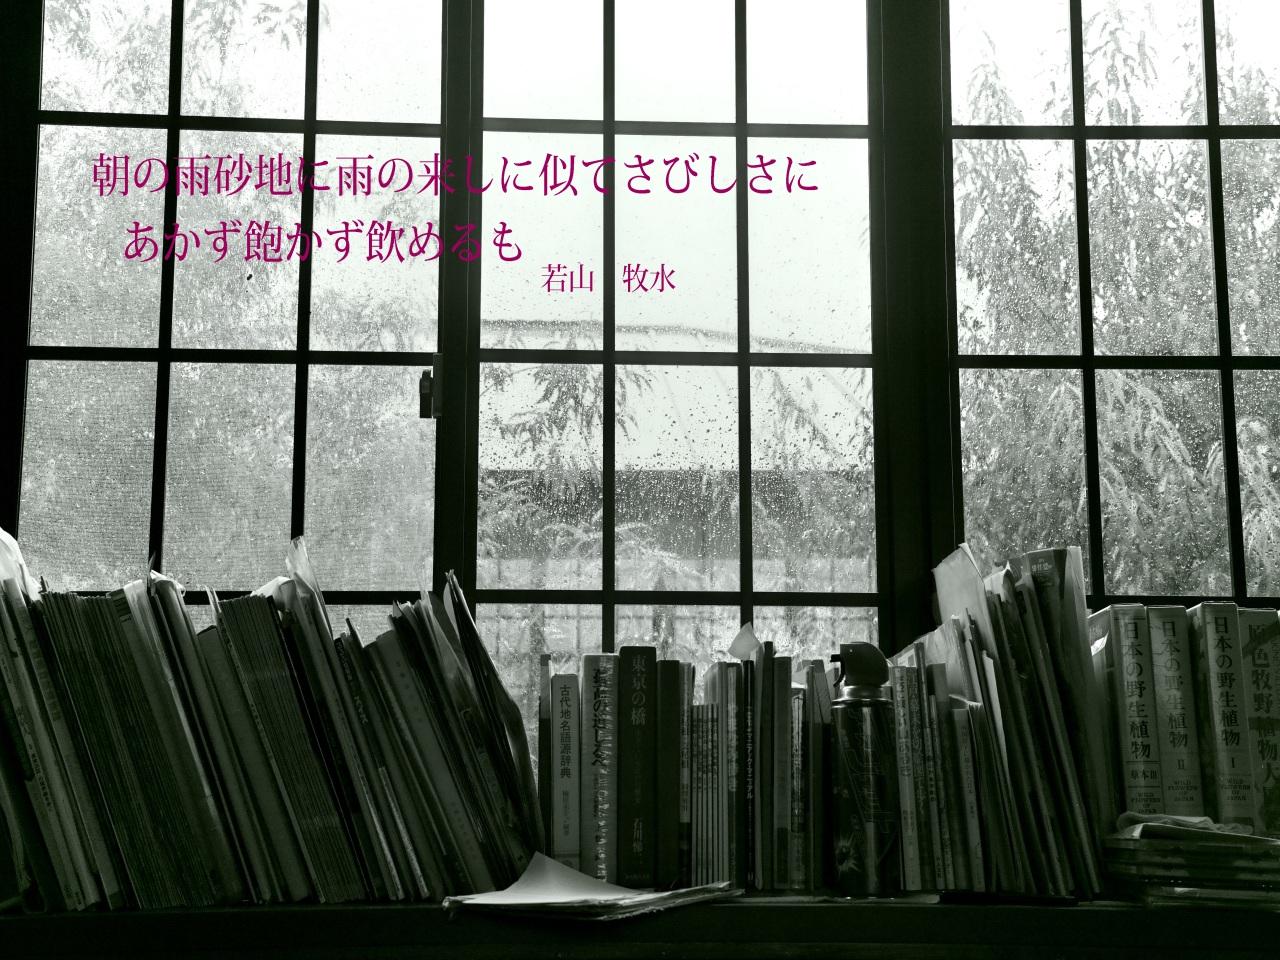 c0008948_16321234.jpg